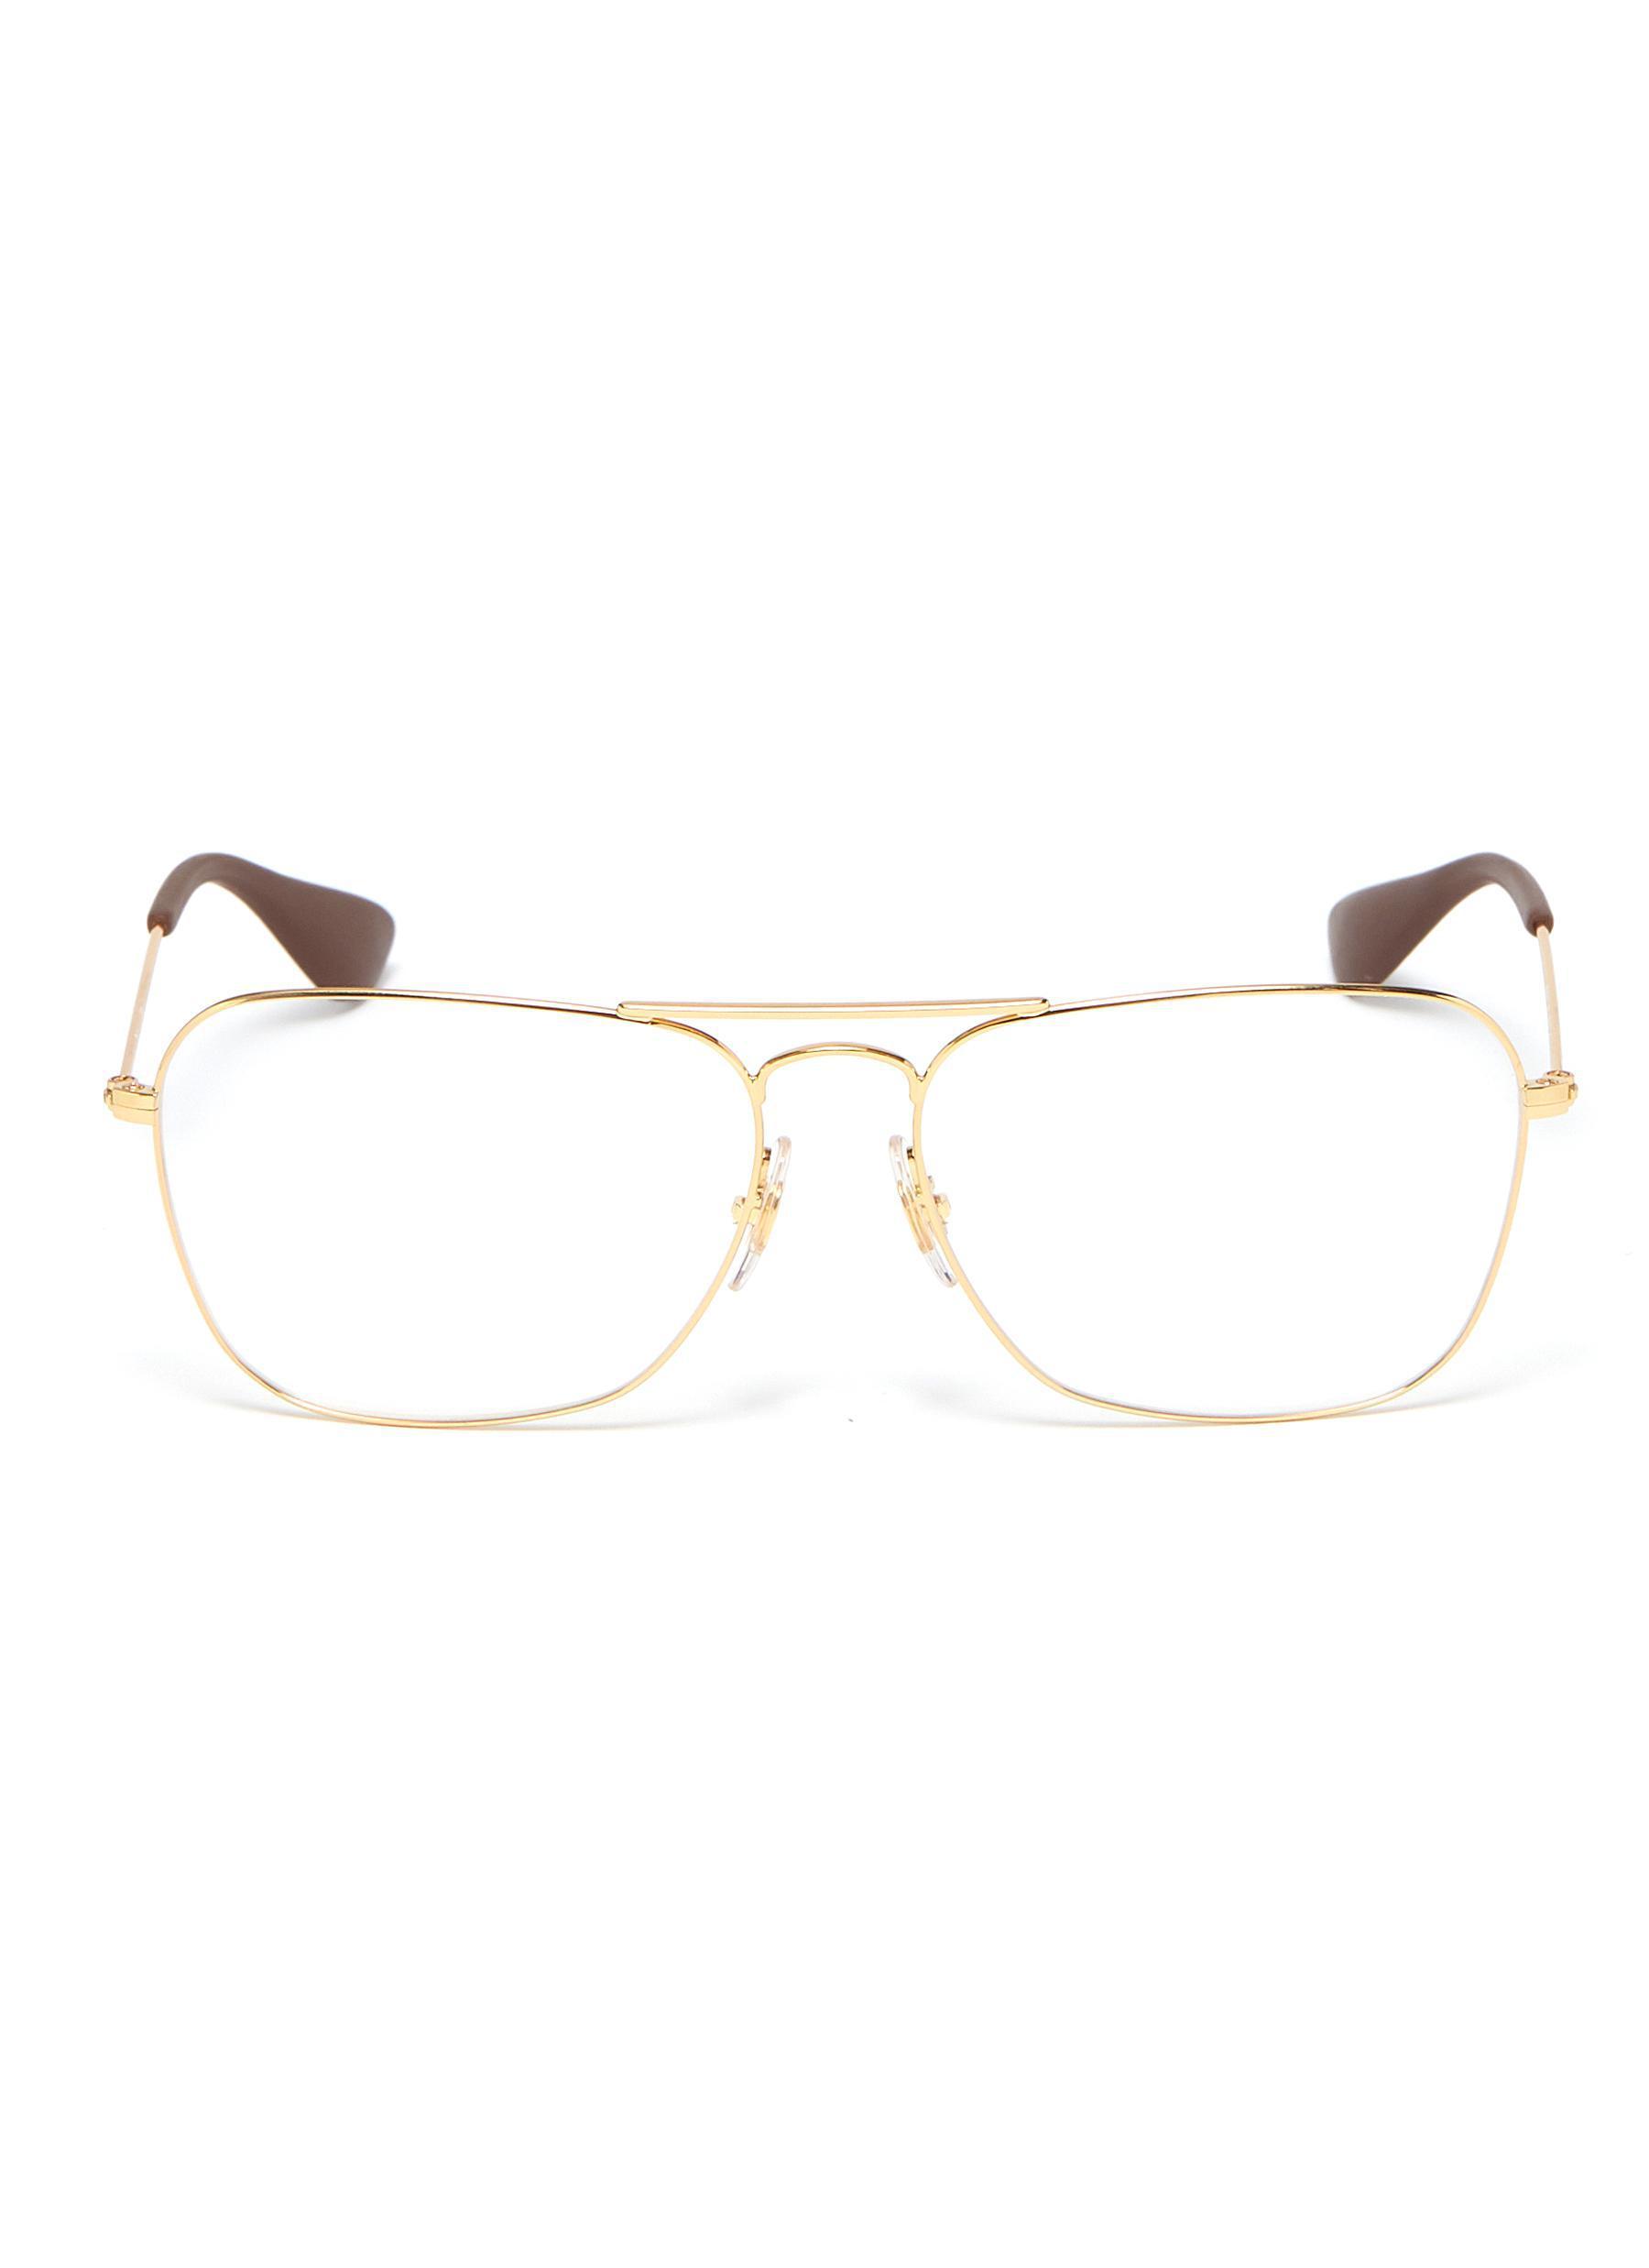 7f77d5cc8 Ray-Ban 'rx3610' Metal Square Optical Glasses - Lyst